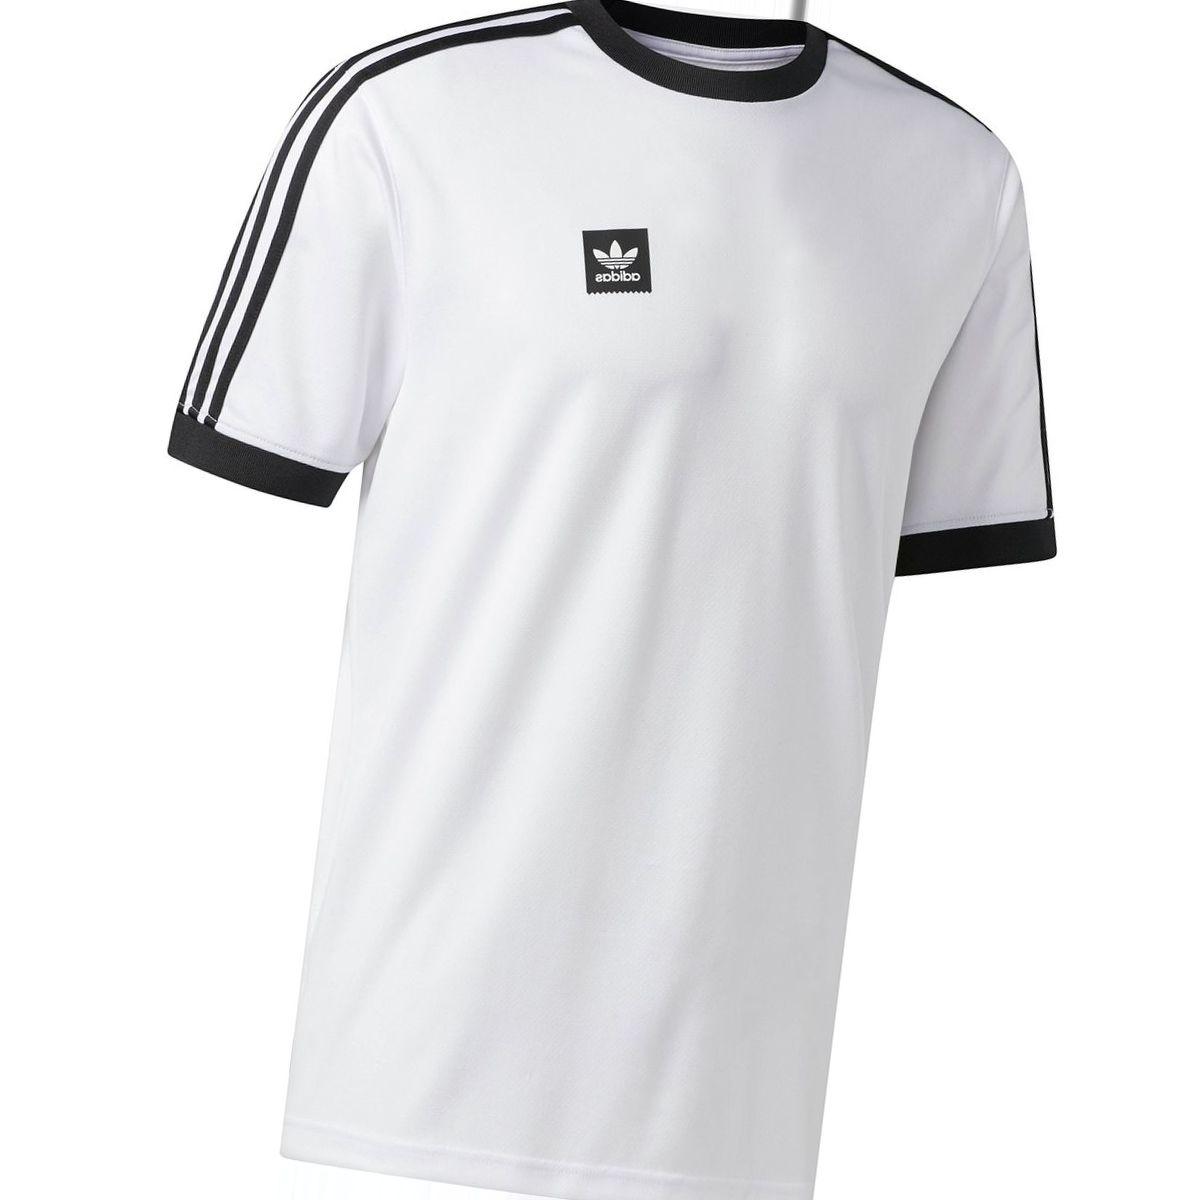 M22 Id Flex but I Like This Shirt Workout Gym Sweatshirt